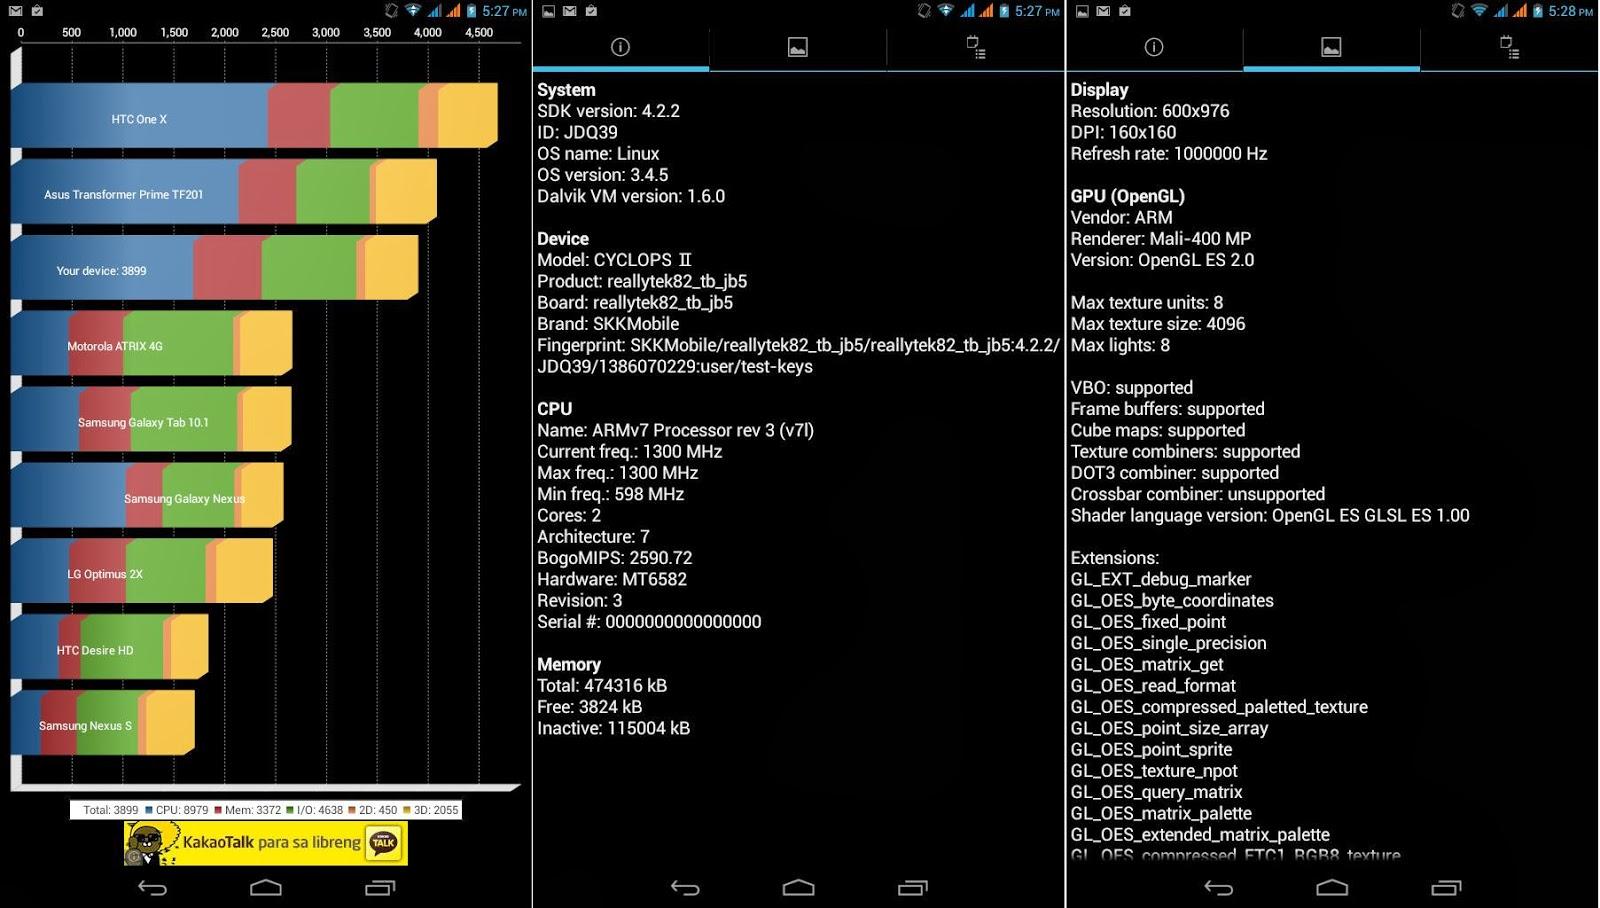 SKK Mobile Cyclops 2 Quadrant 3899